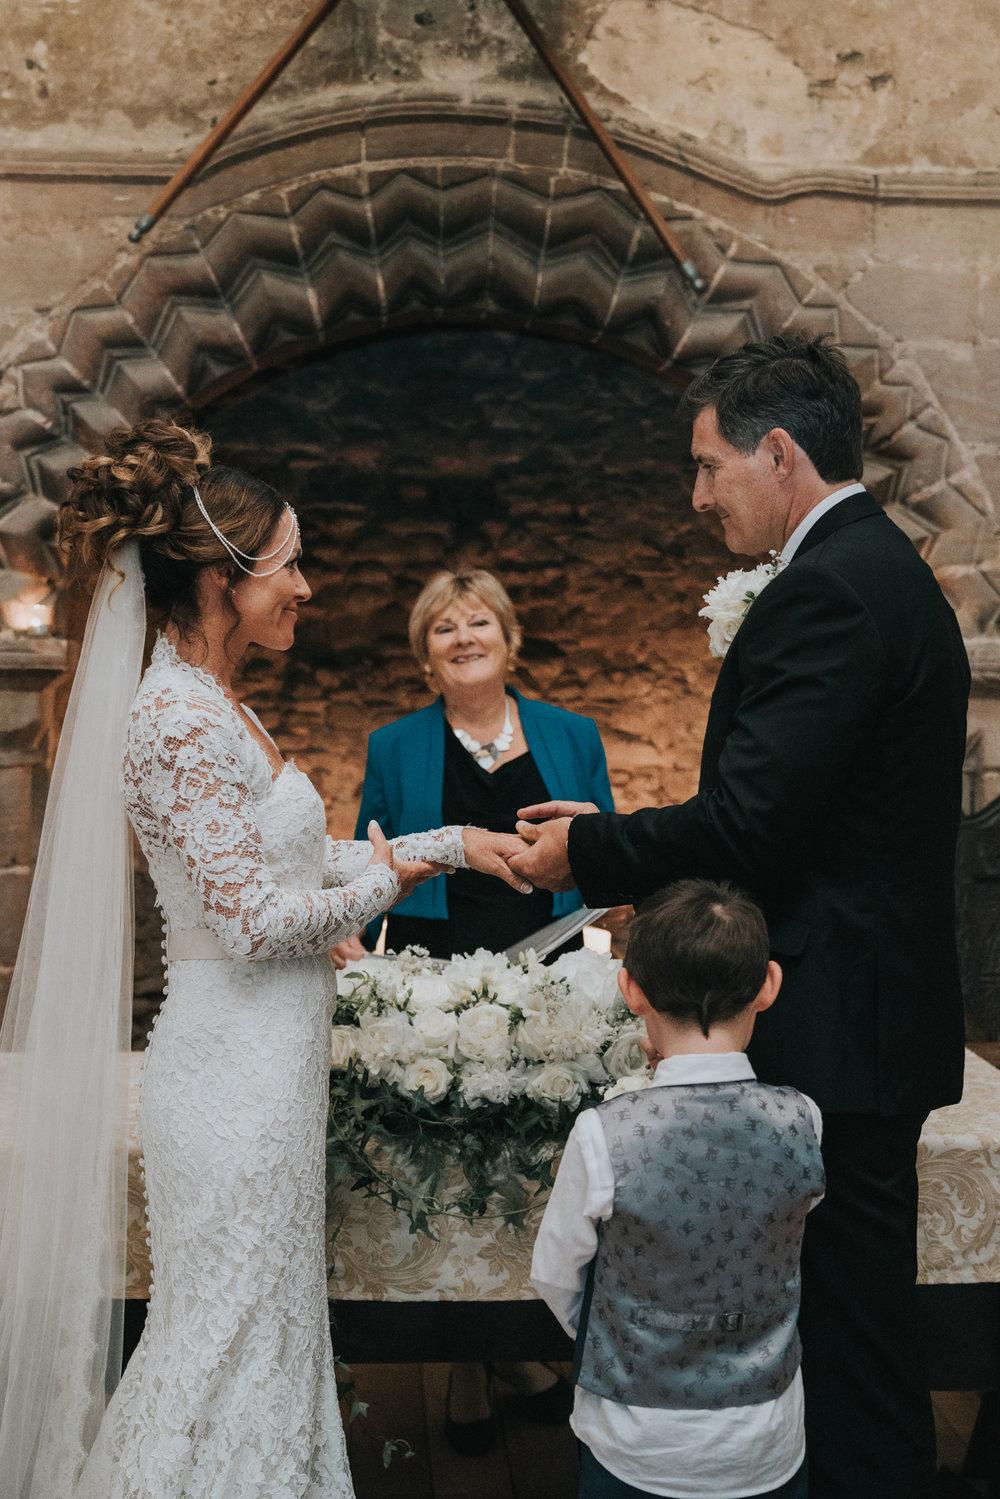 grace-elizabeth-boho-wedding-headingham-castle-essex-wedding-photographer-41.jpg